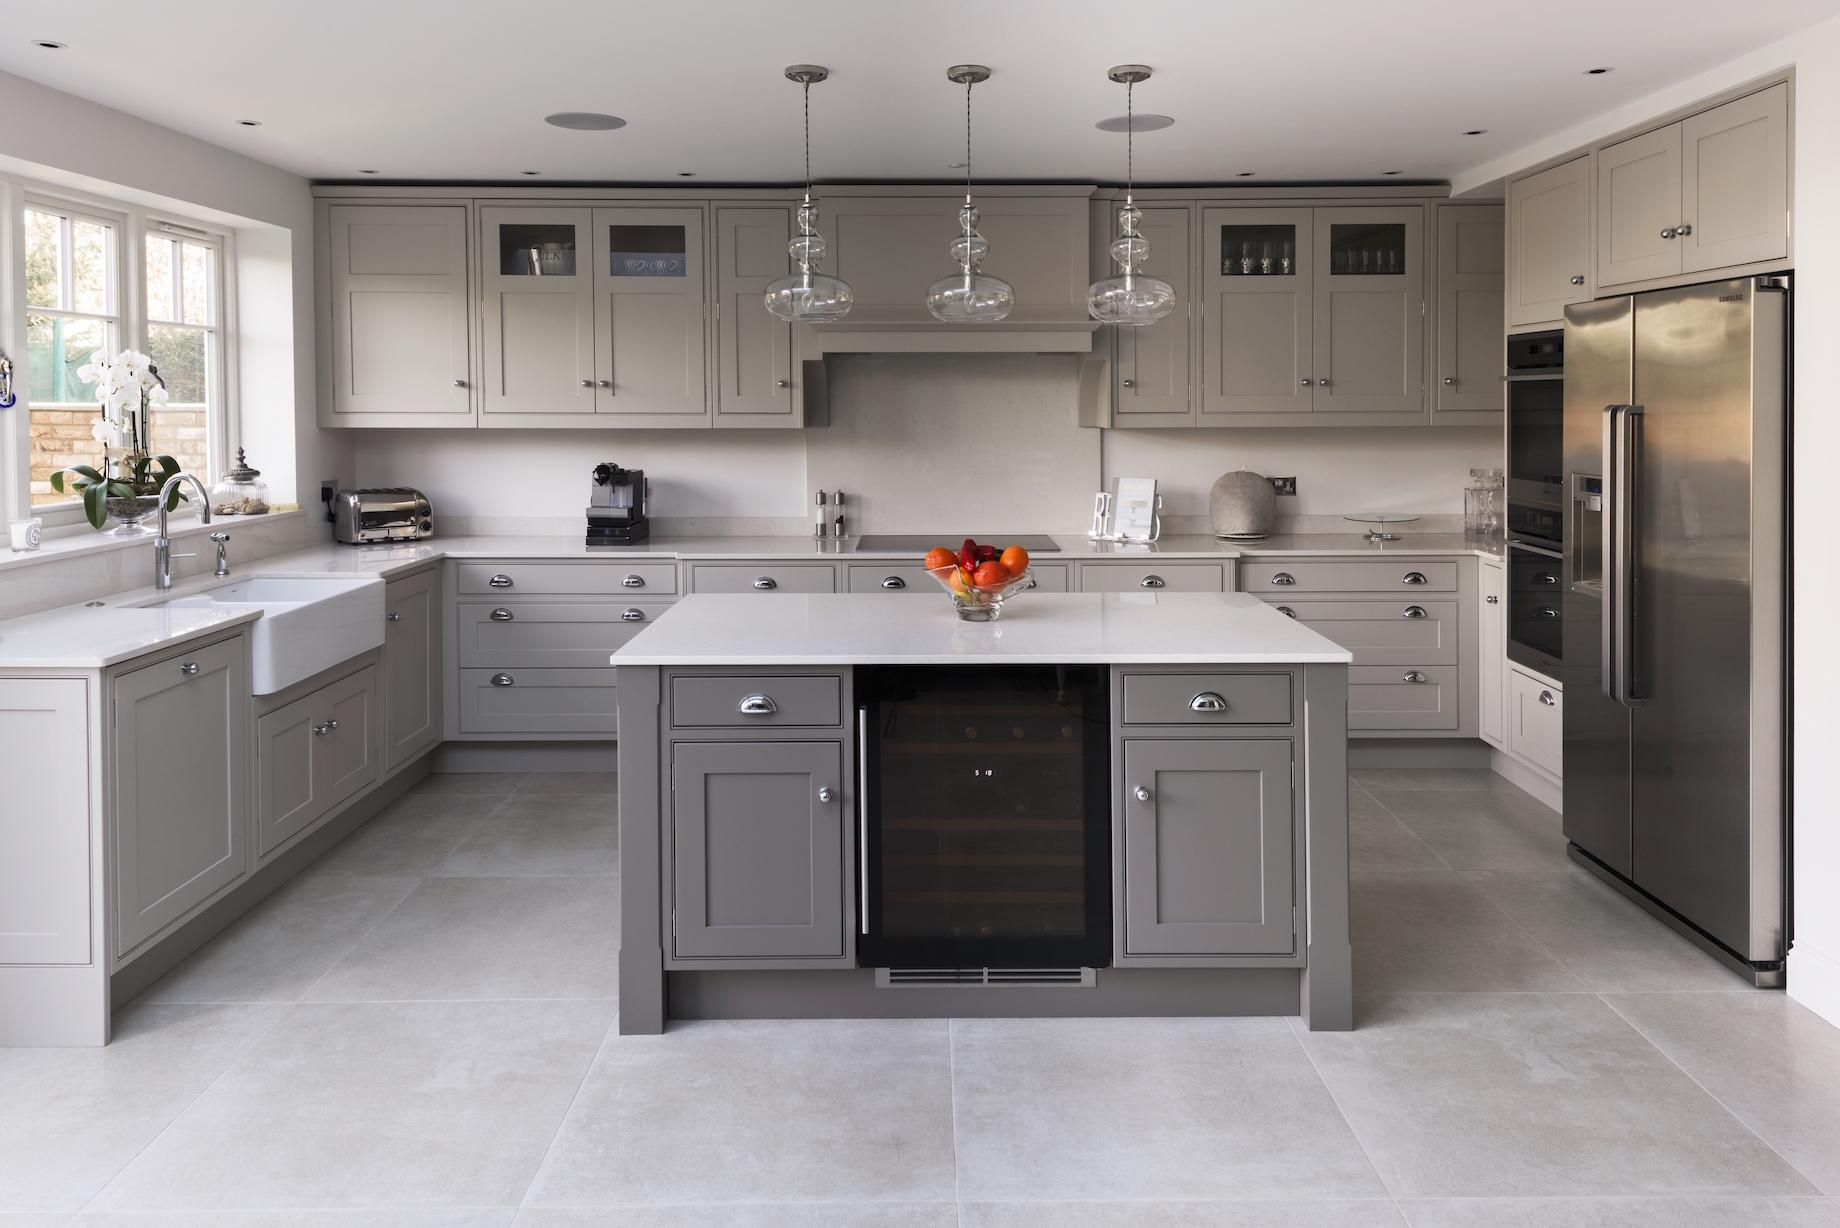 About grand design kitchen designers for Grand design kitchen ideas